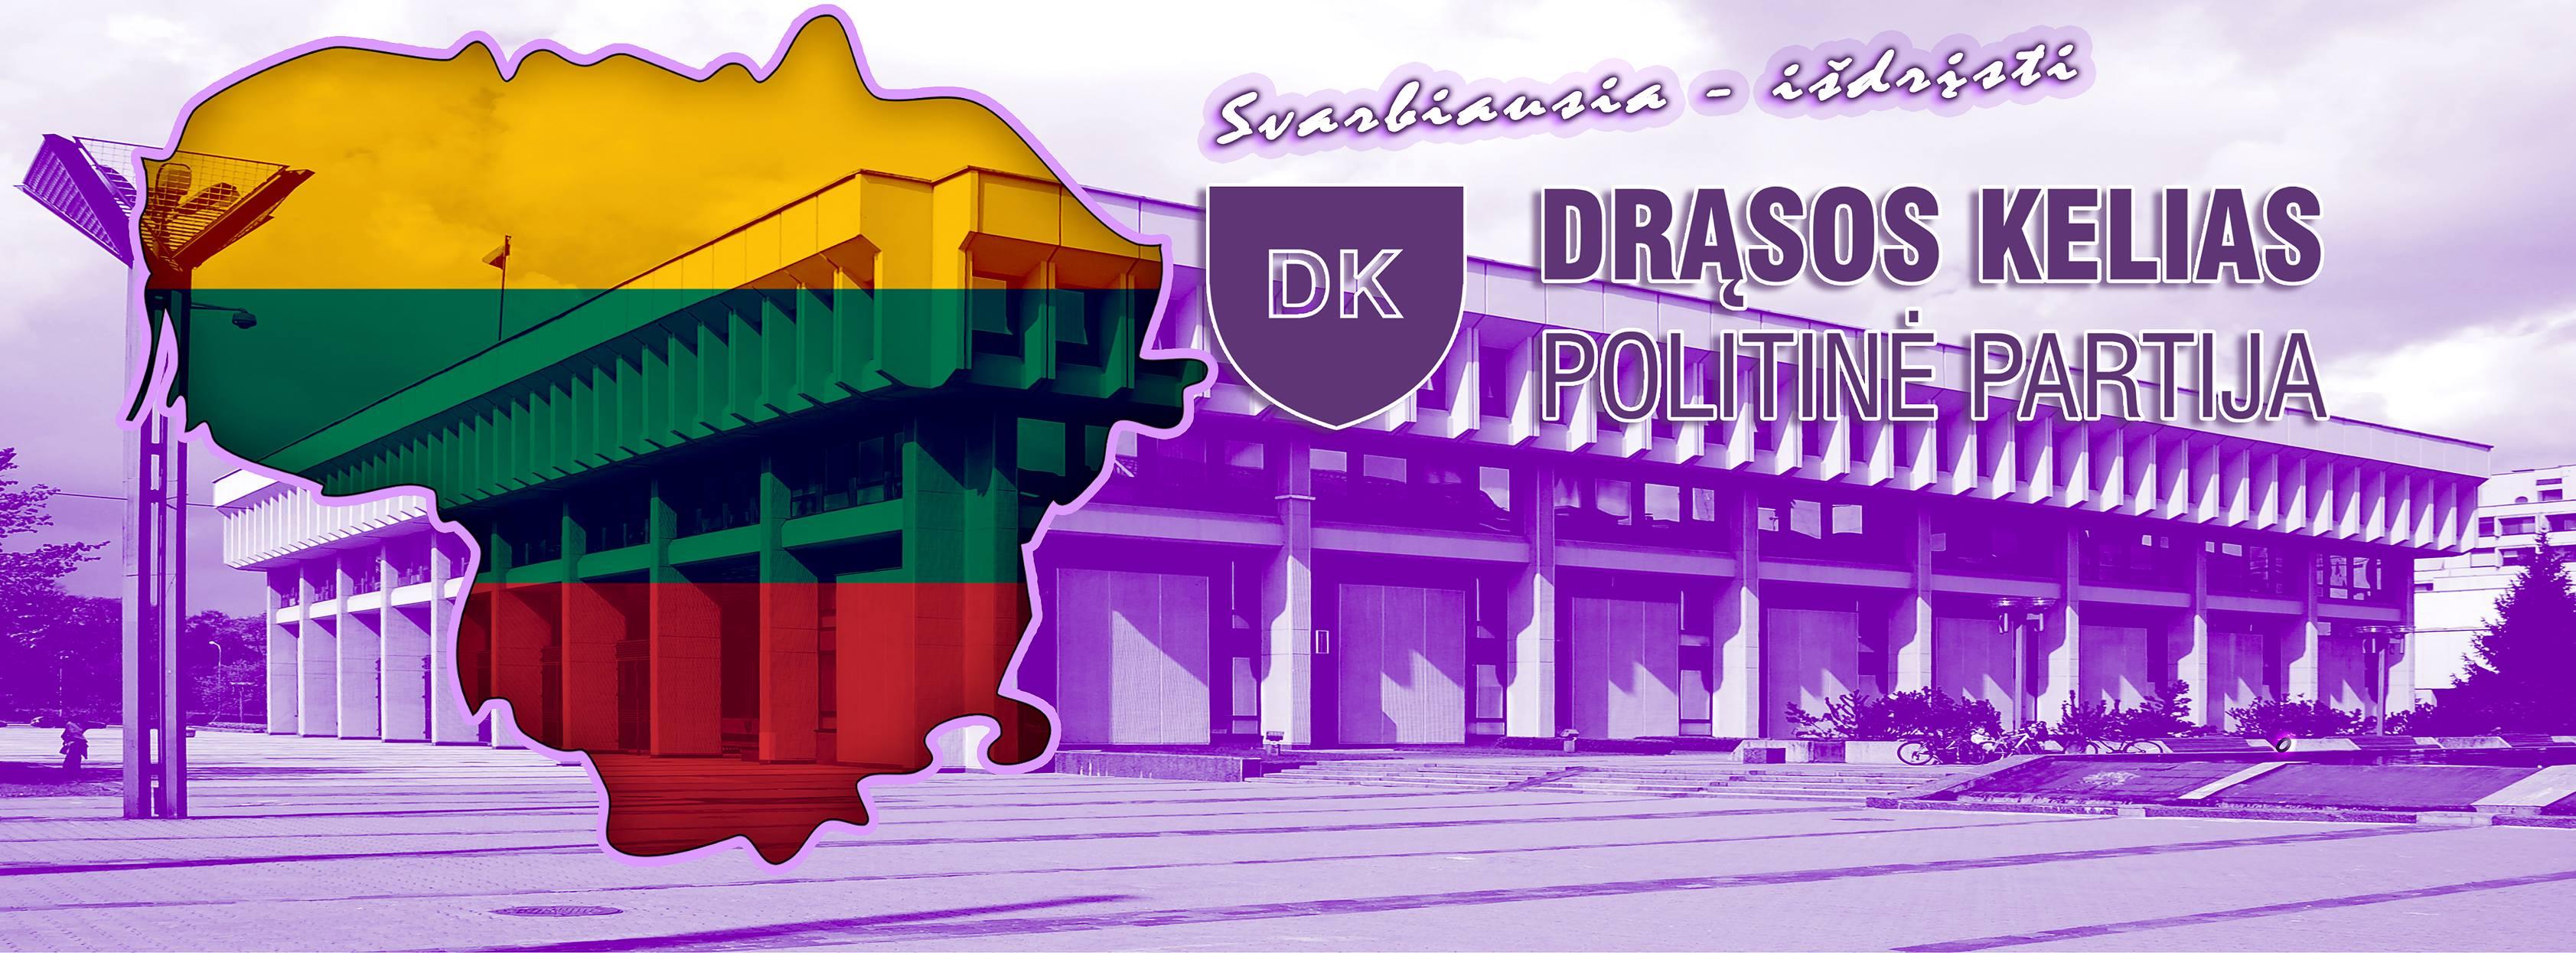 DK rinkimuose 2016